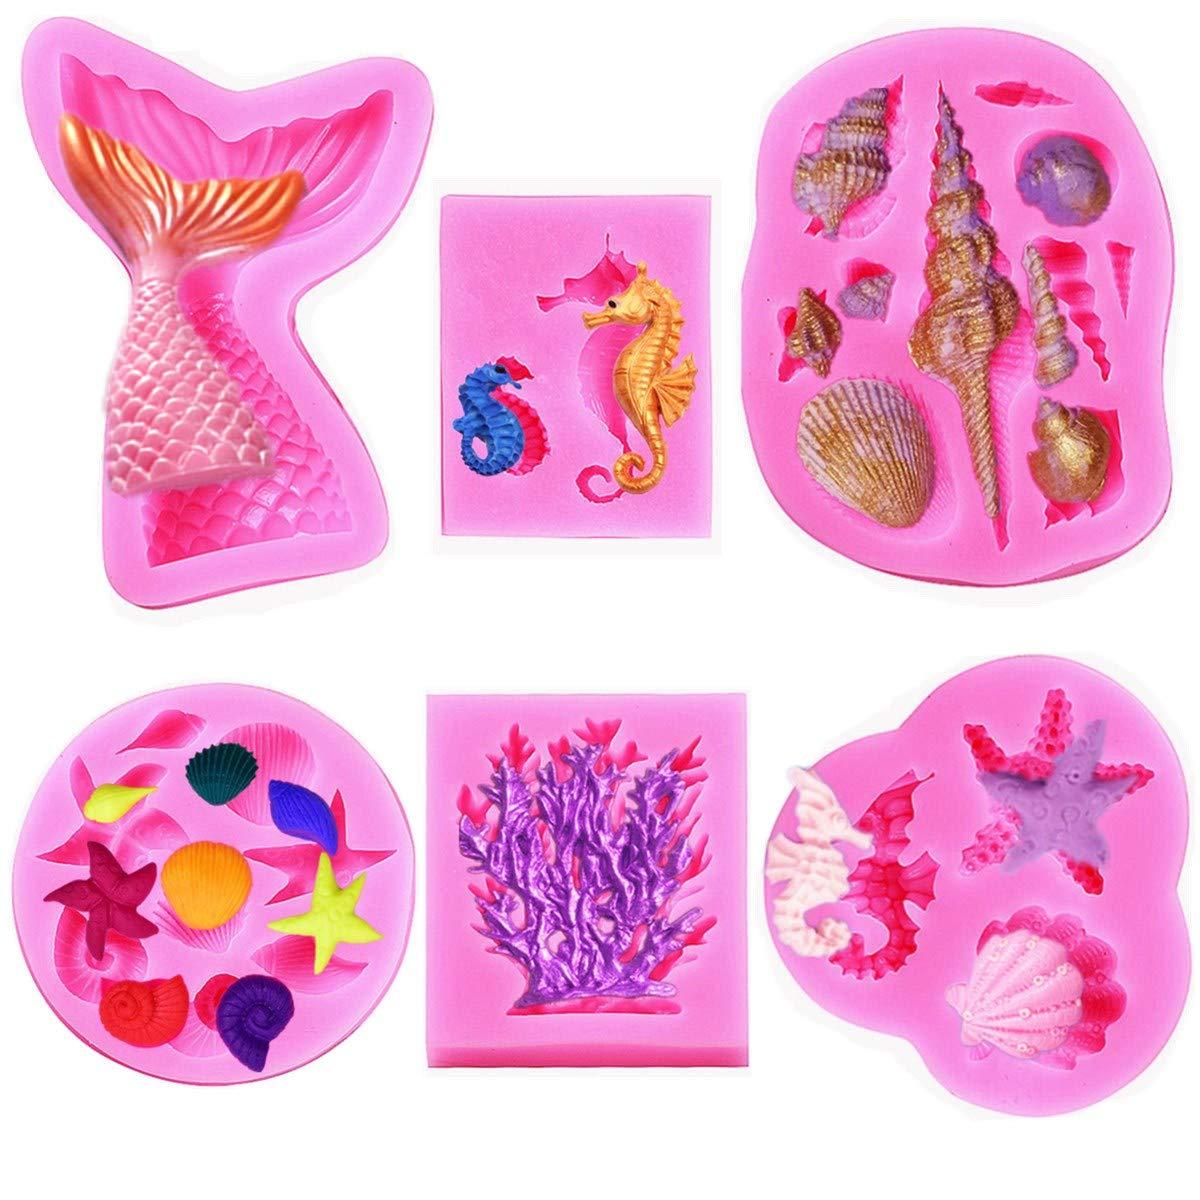 Marine Theme Fondant Silicone Mold,Seashell,conch, Mermaid Tail,Seahorse,starfish,coral, DIY Handmade Baking Tools for Mermaid Theme Cake Decoration(6pack)